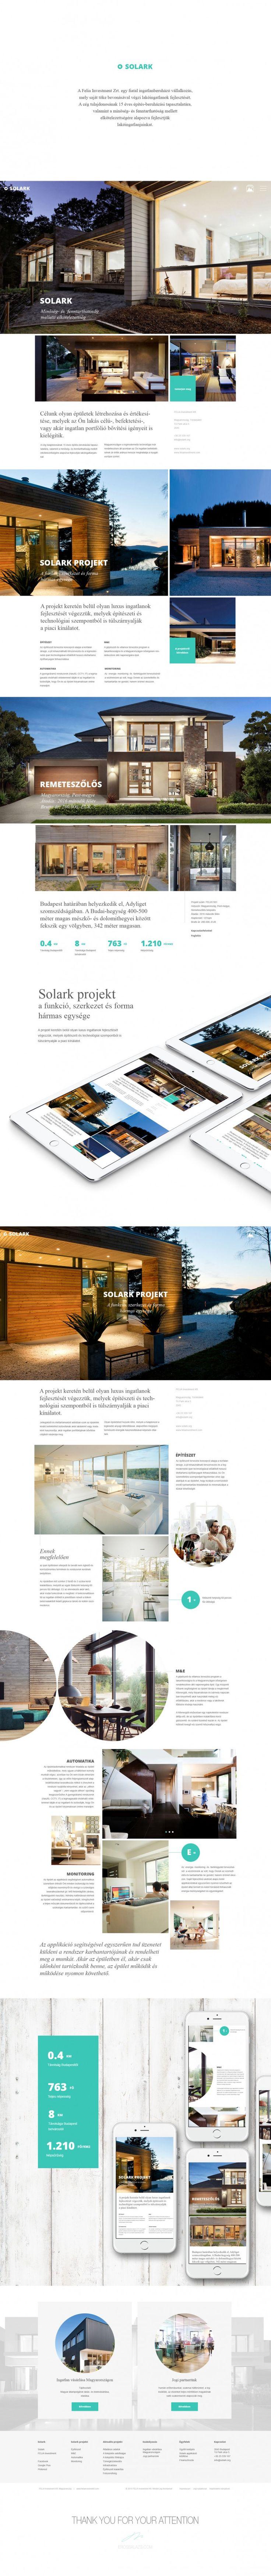 Solark. Luxury home near to Budapest, Hungary. Responsive webdesign concept.